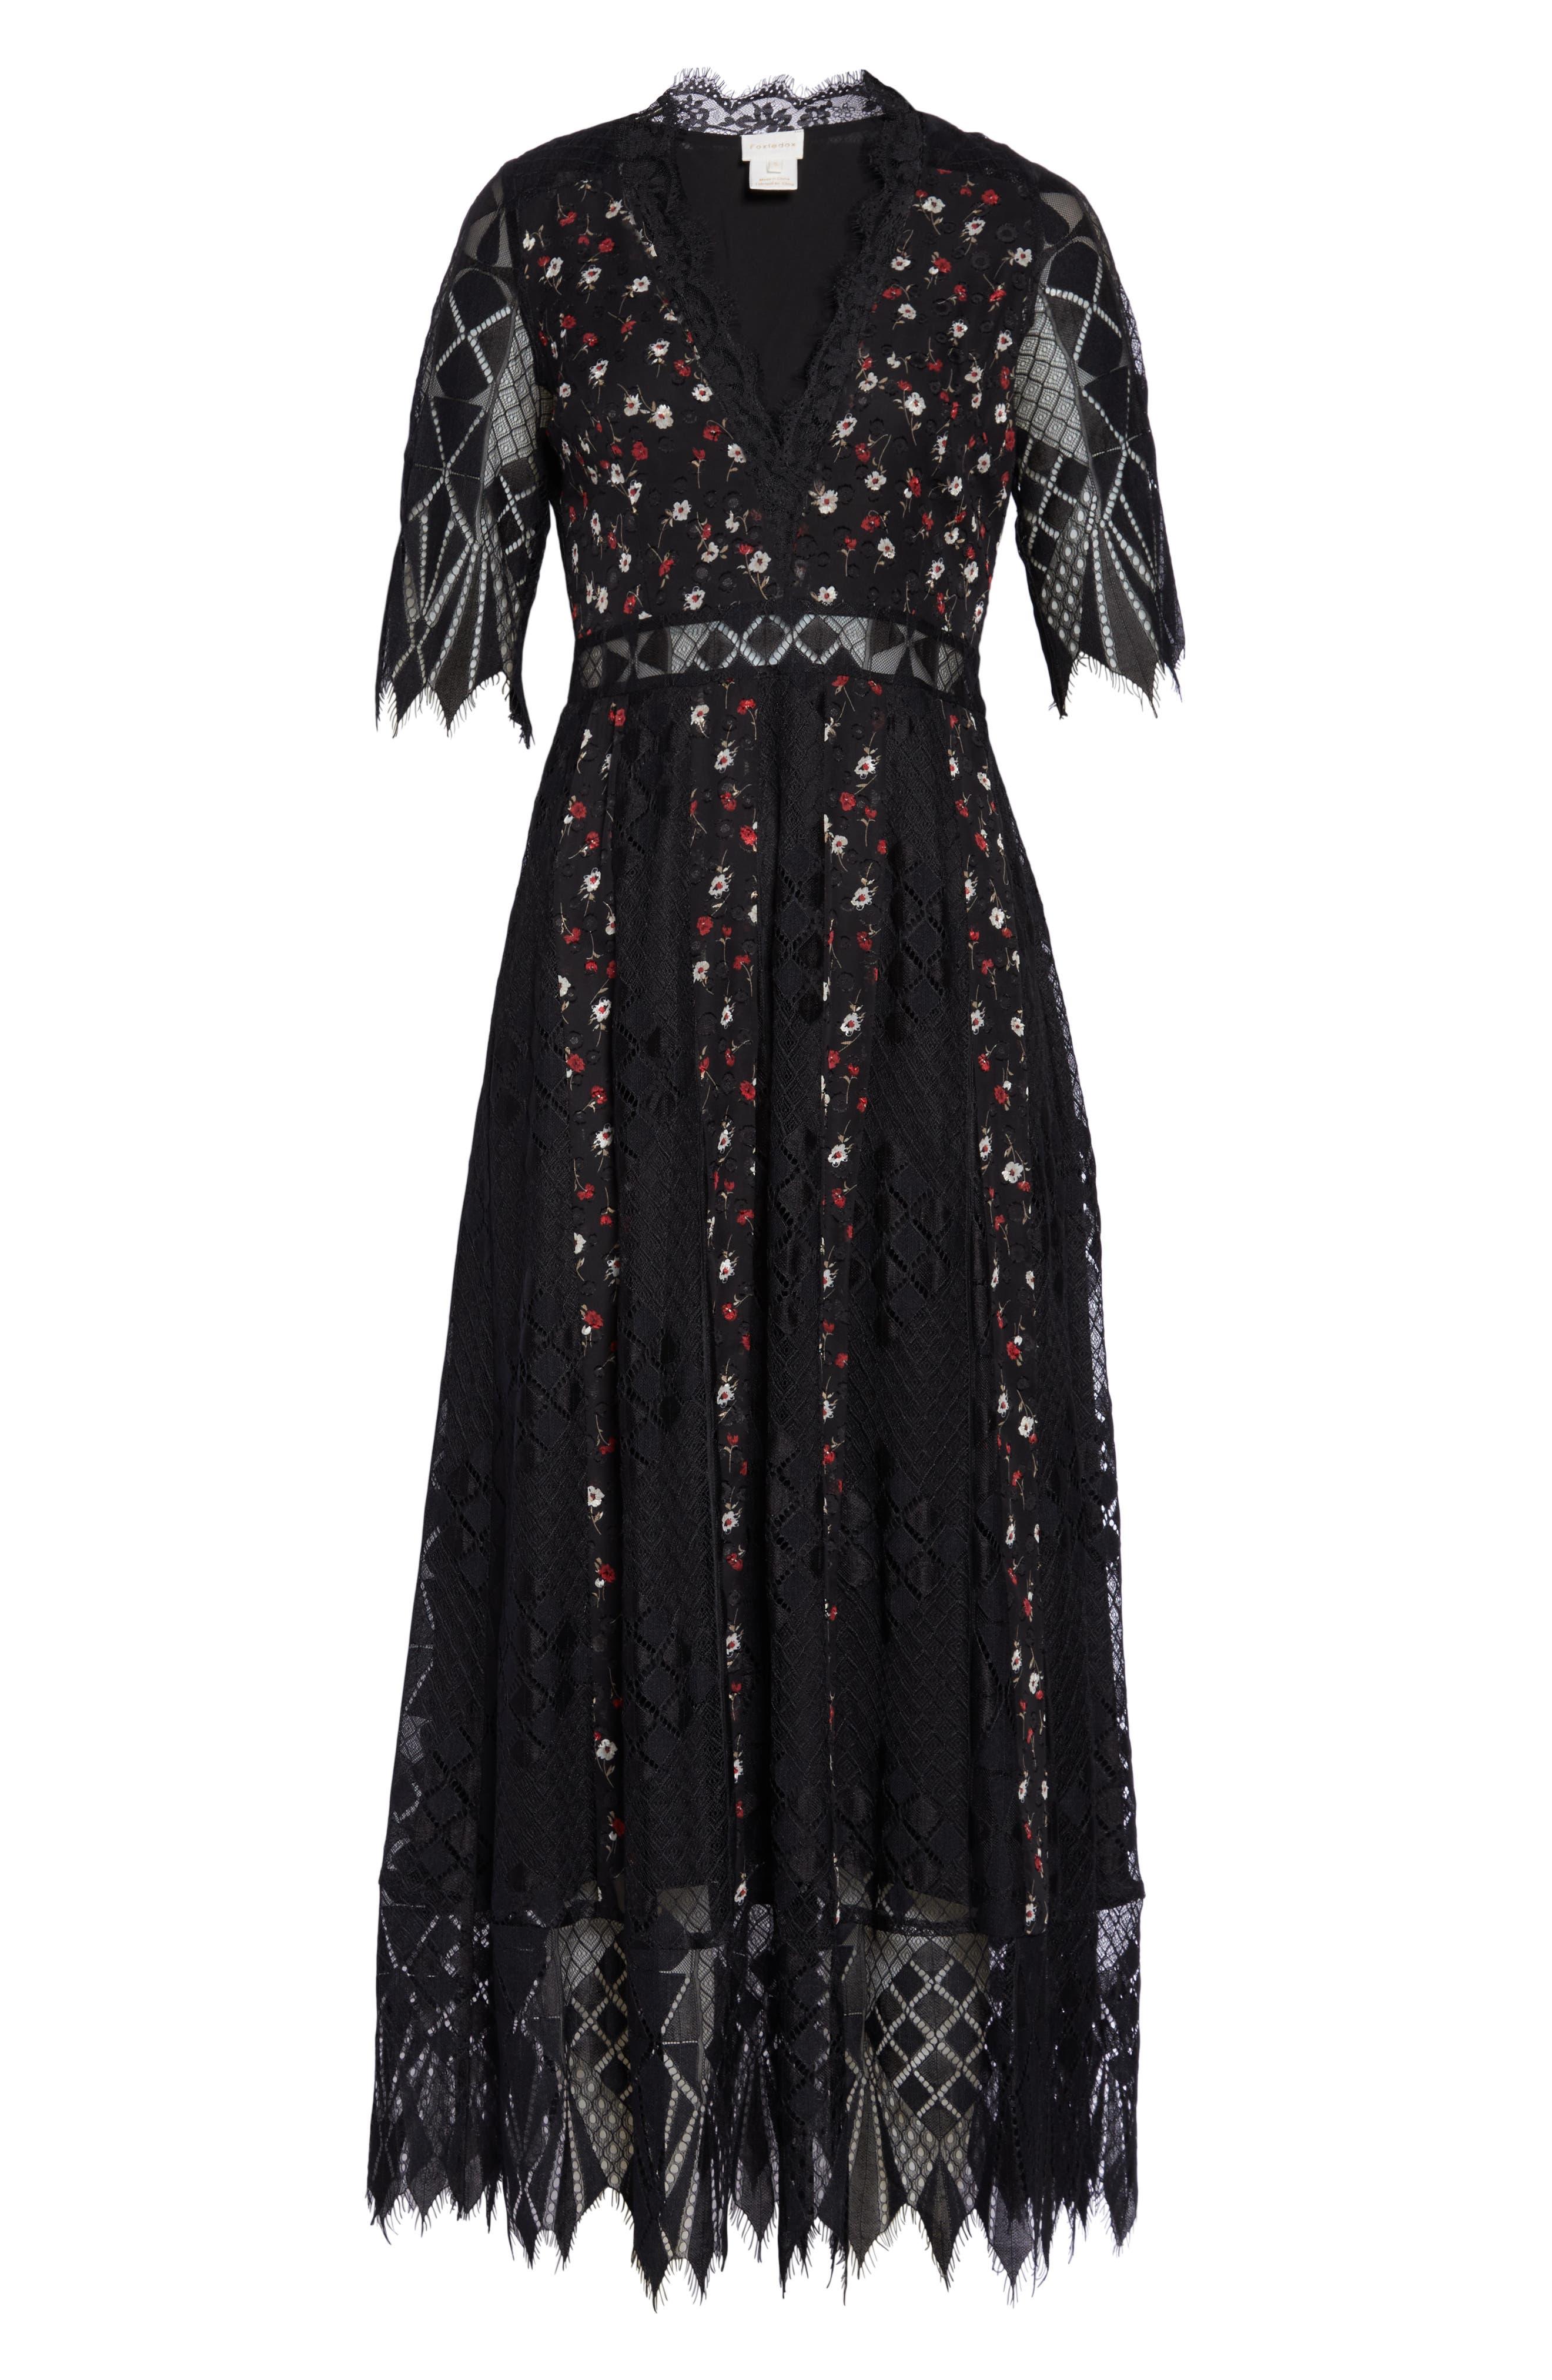 FOXIEDOX, Josefine Lace & Clip Dot Tea Length Dress, Alternate thumbnail 7, color, 001